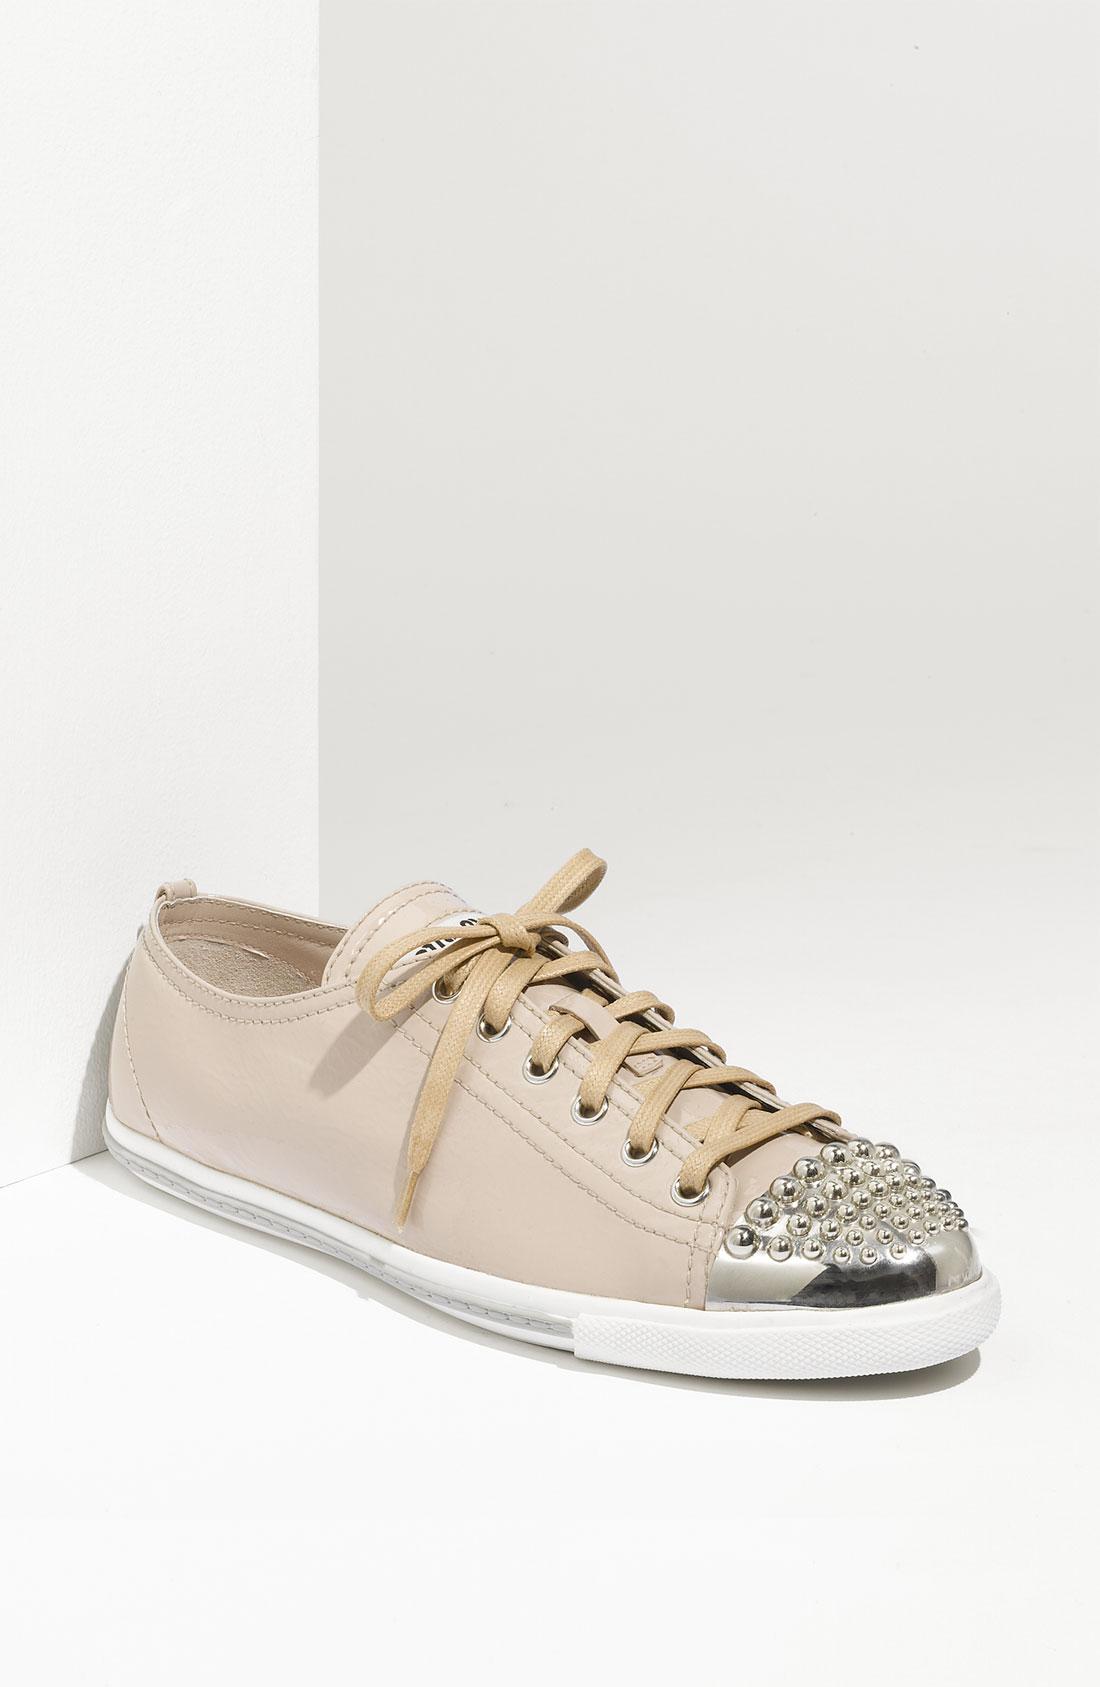 miu miu glitter 2 sneaker in beige nude leather lyst. Black Bedroom Furniture Sets. Home Design Ideas